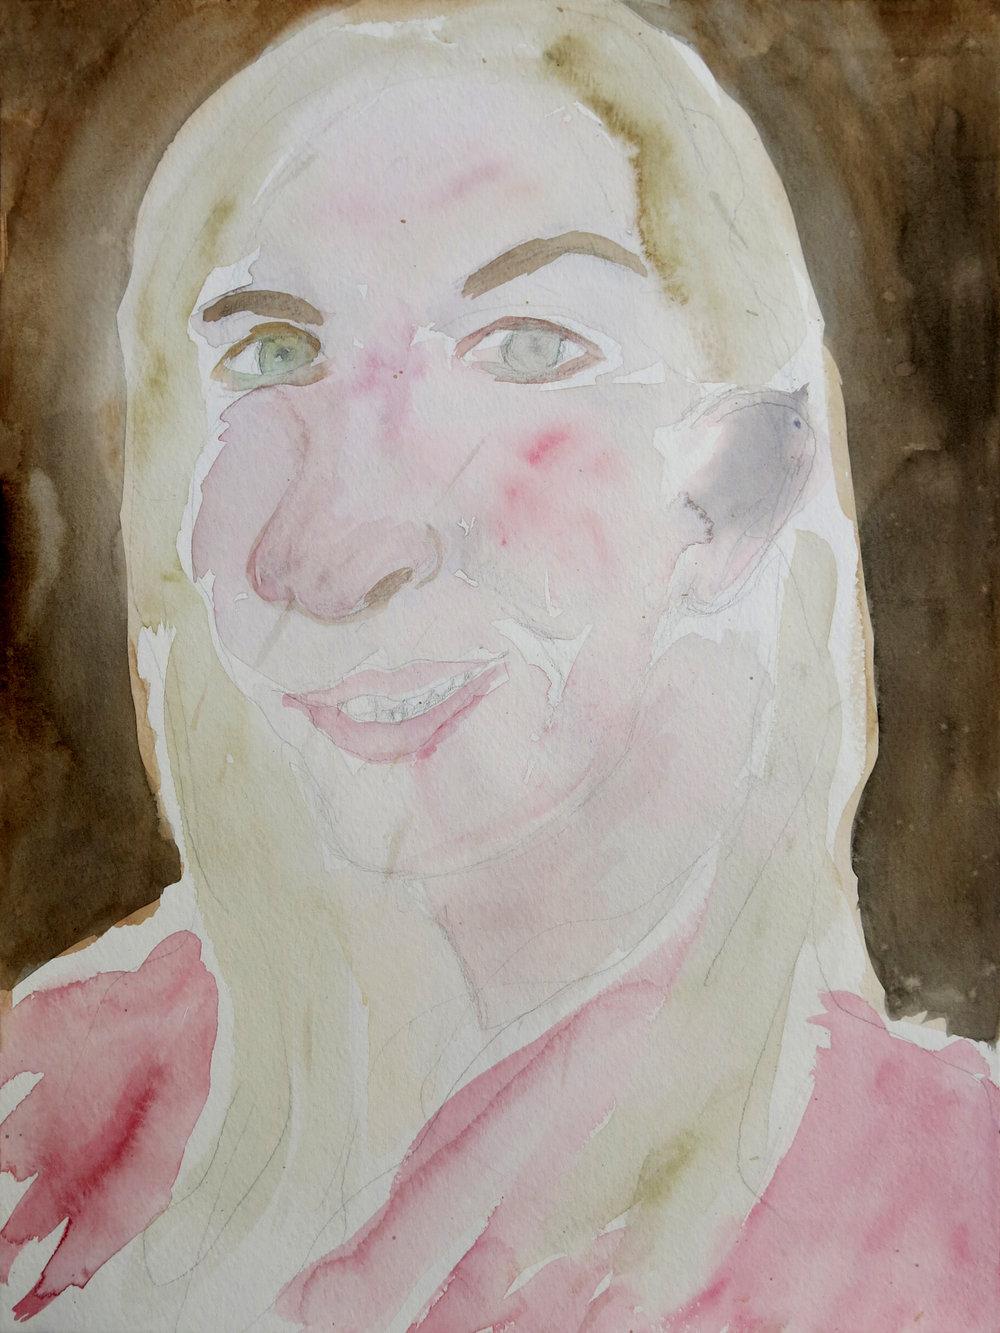 Barbra Streisand Portrait #201